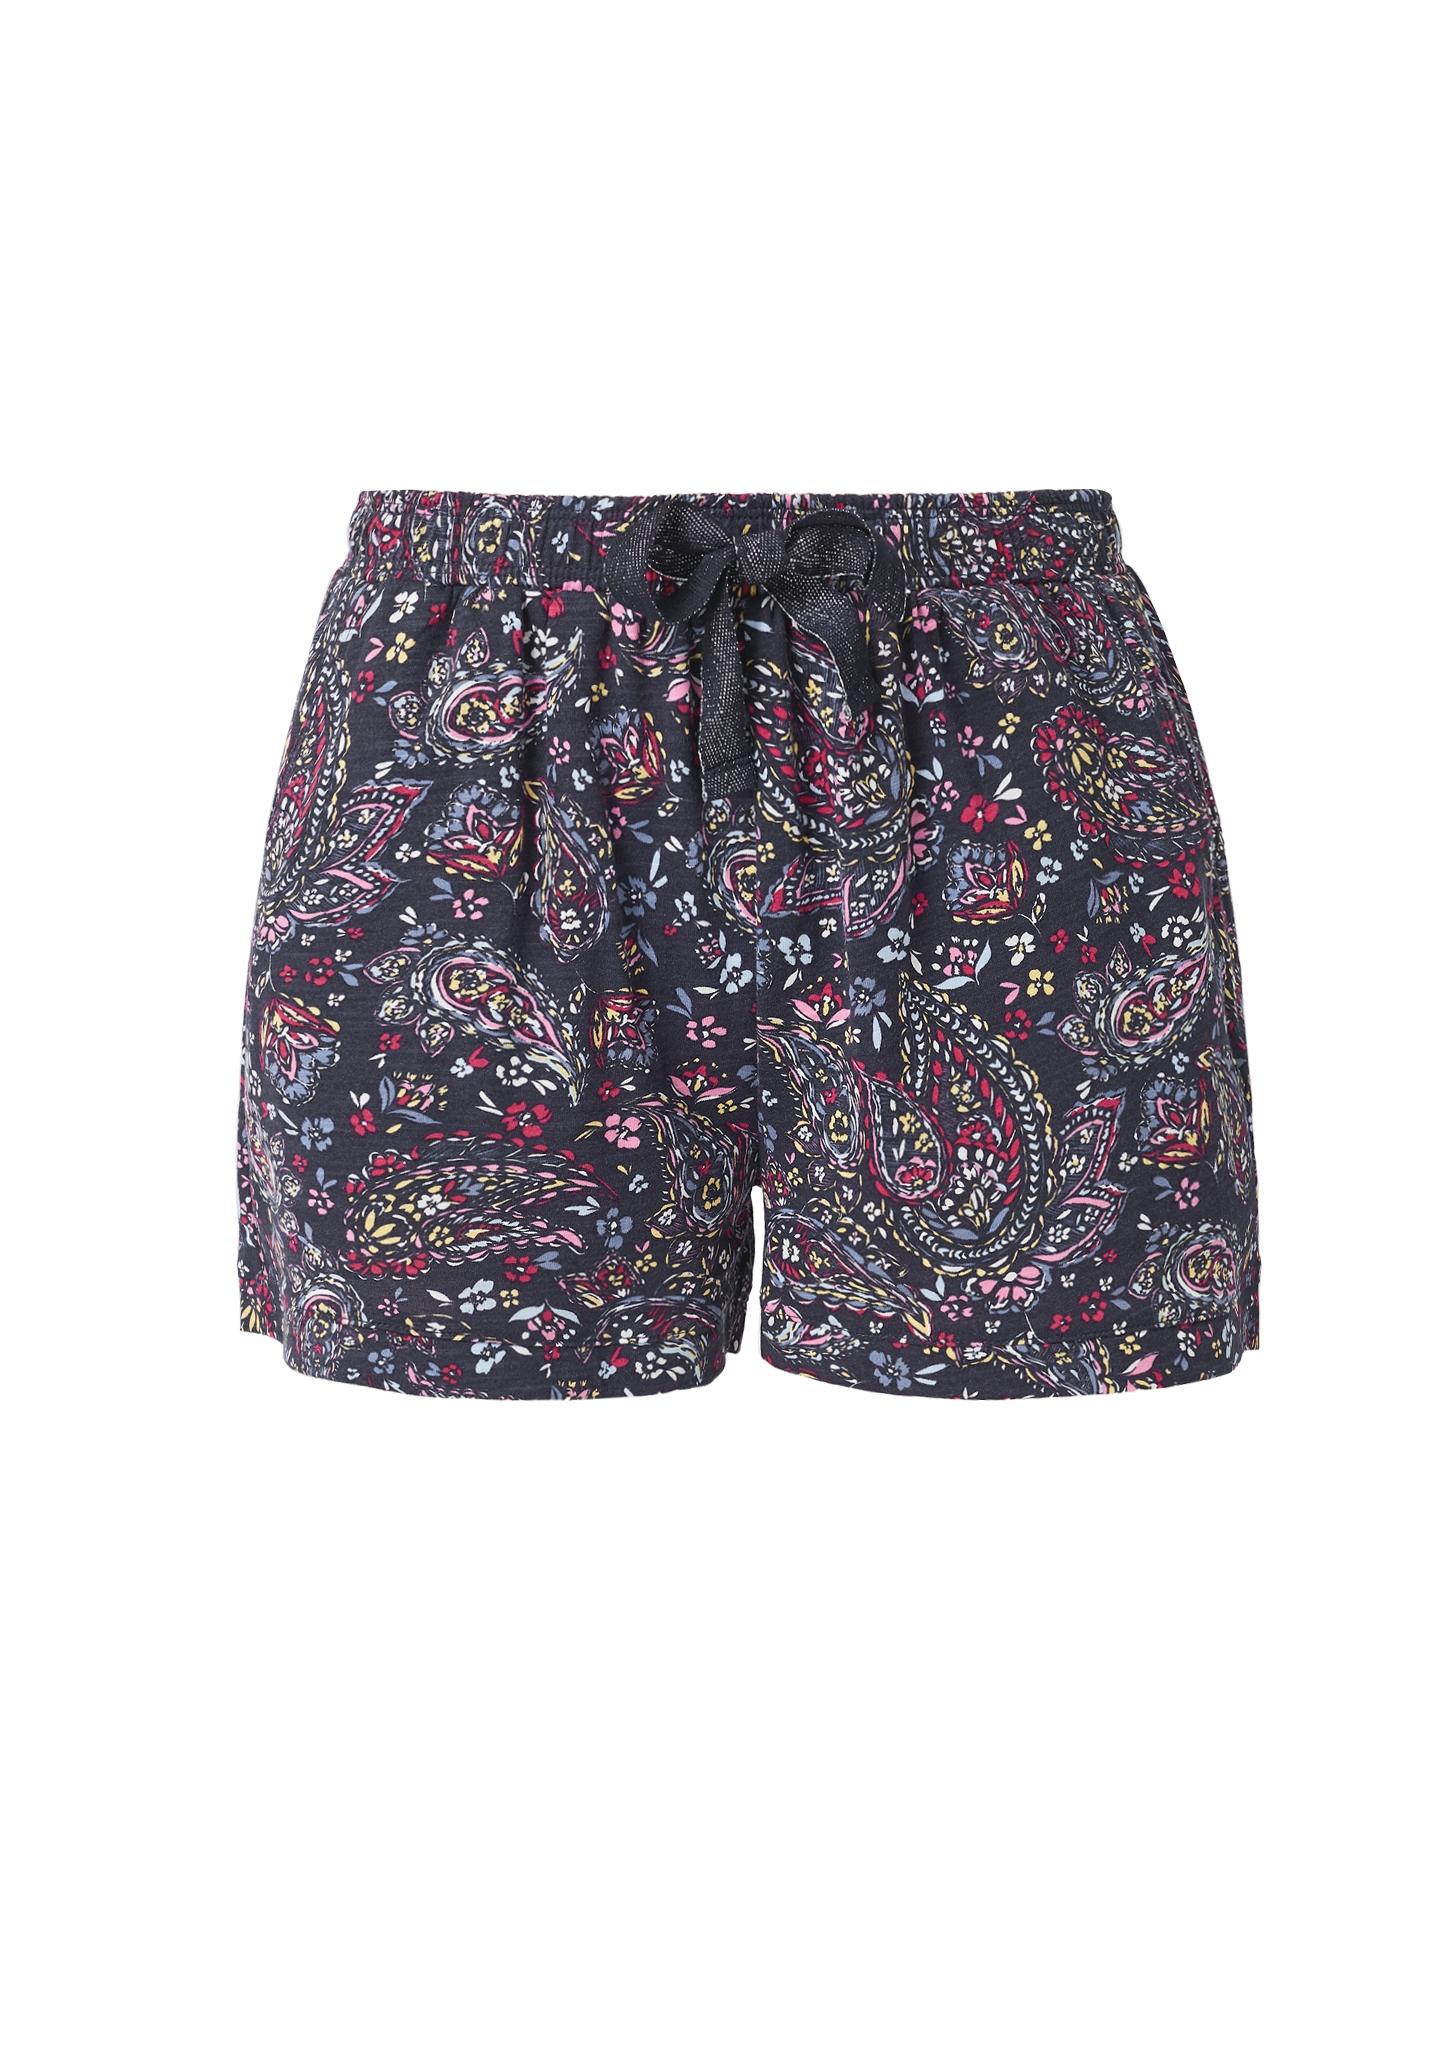 s-Oliver-Casual-Women-Jerseyshorts-mit-Musterprint-Neu Indexbild 10